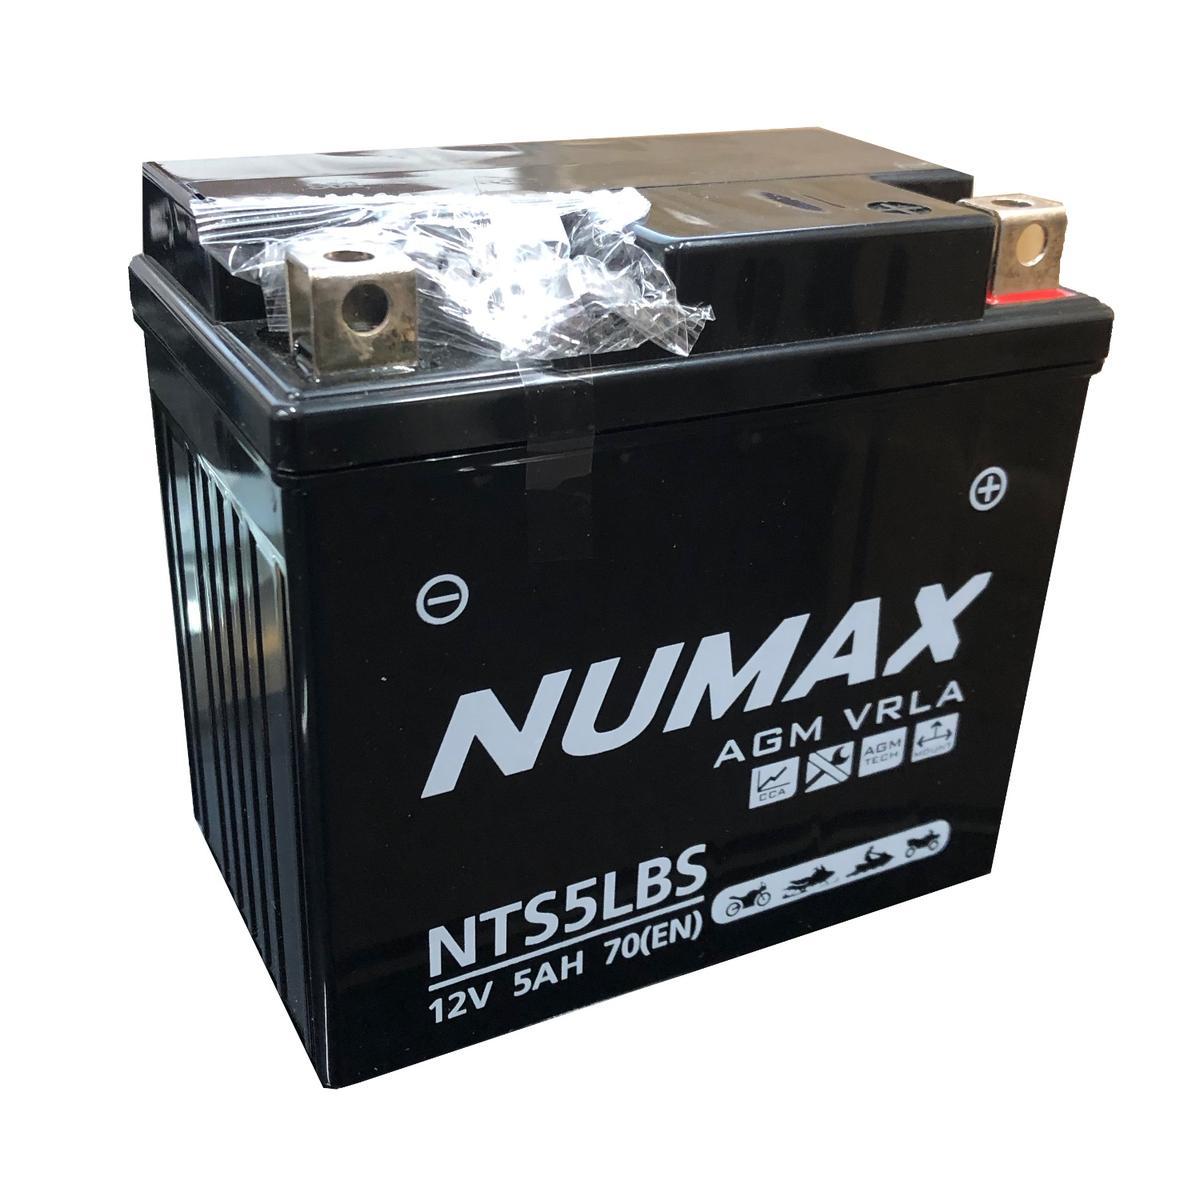 Numax 12v NTS5LBS Motorbike Bike Battery YAMAHA 250cc WR250F YTX5L-4